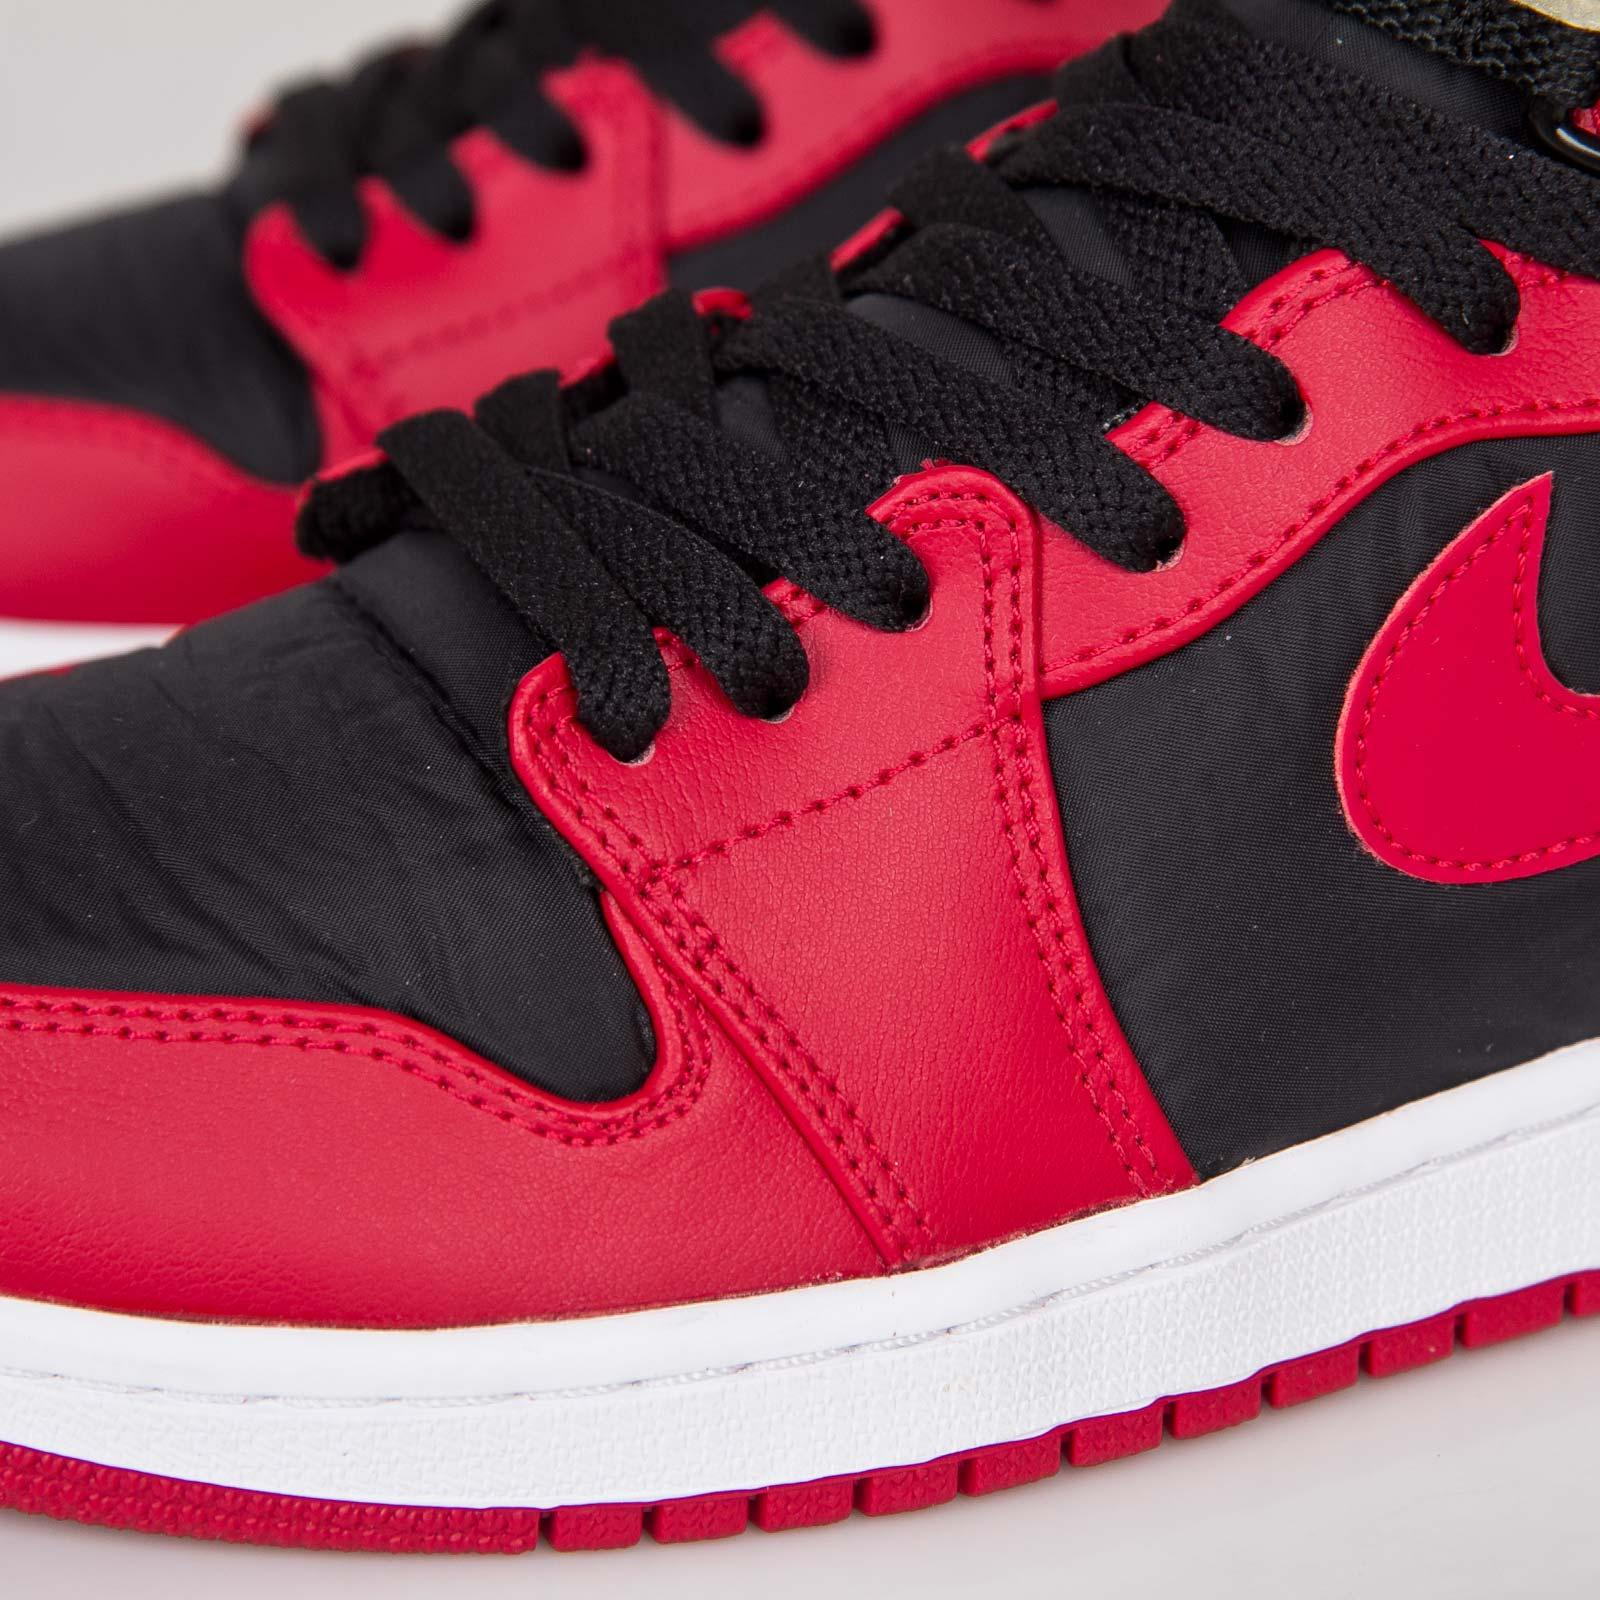 1d7f9ef0129 ... black gym red fad67 449ef  switzerland jordan brand air jordan 1 high  strap c6631 37490